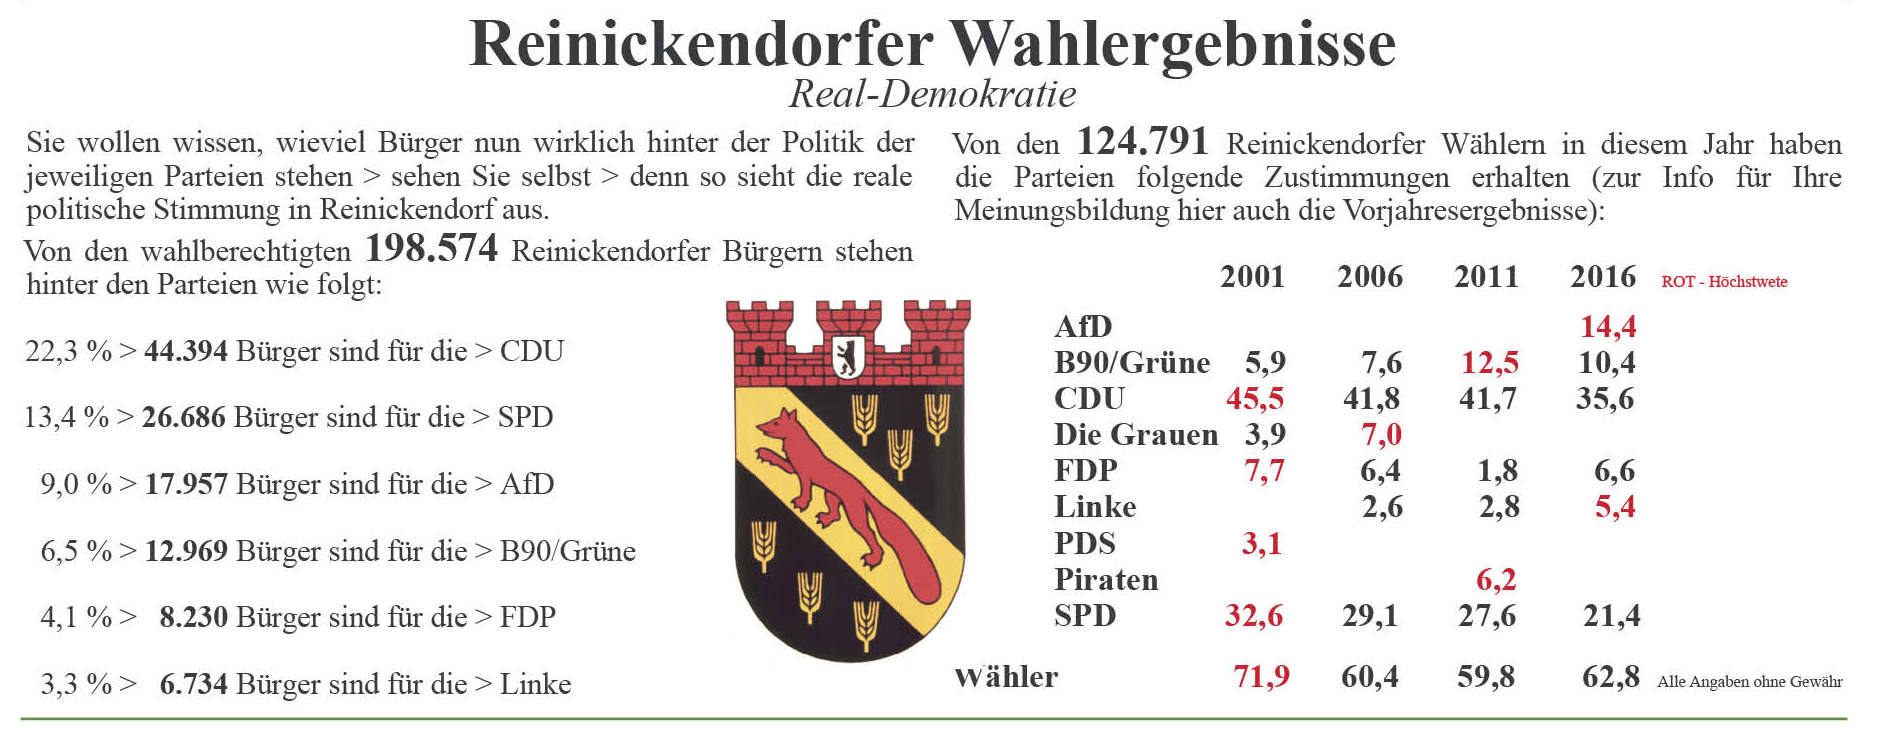 wahl-reinickendorf-2016